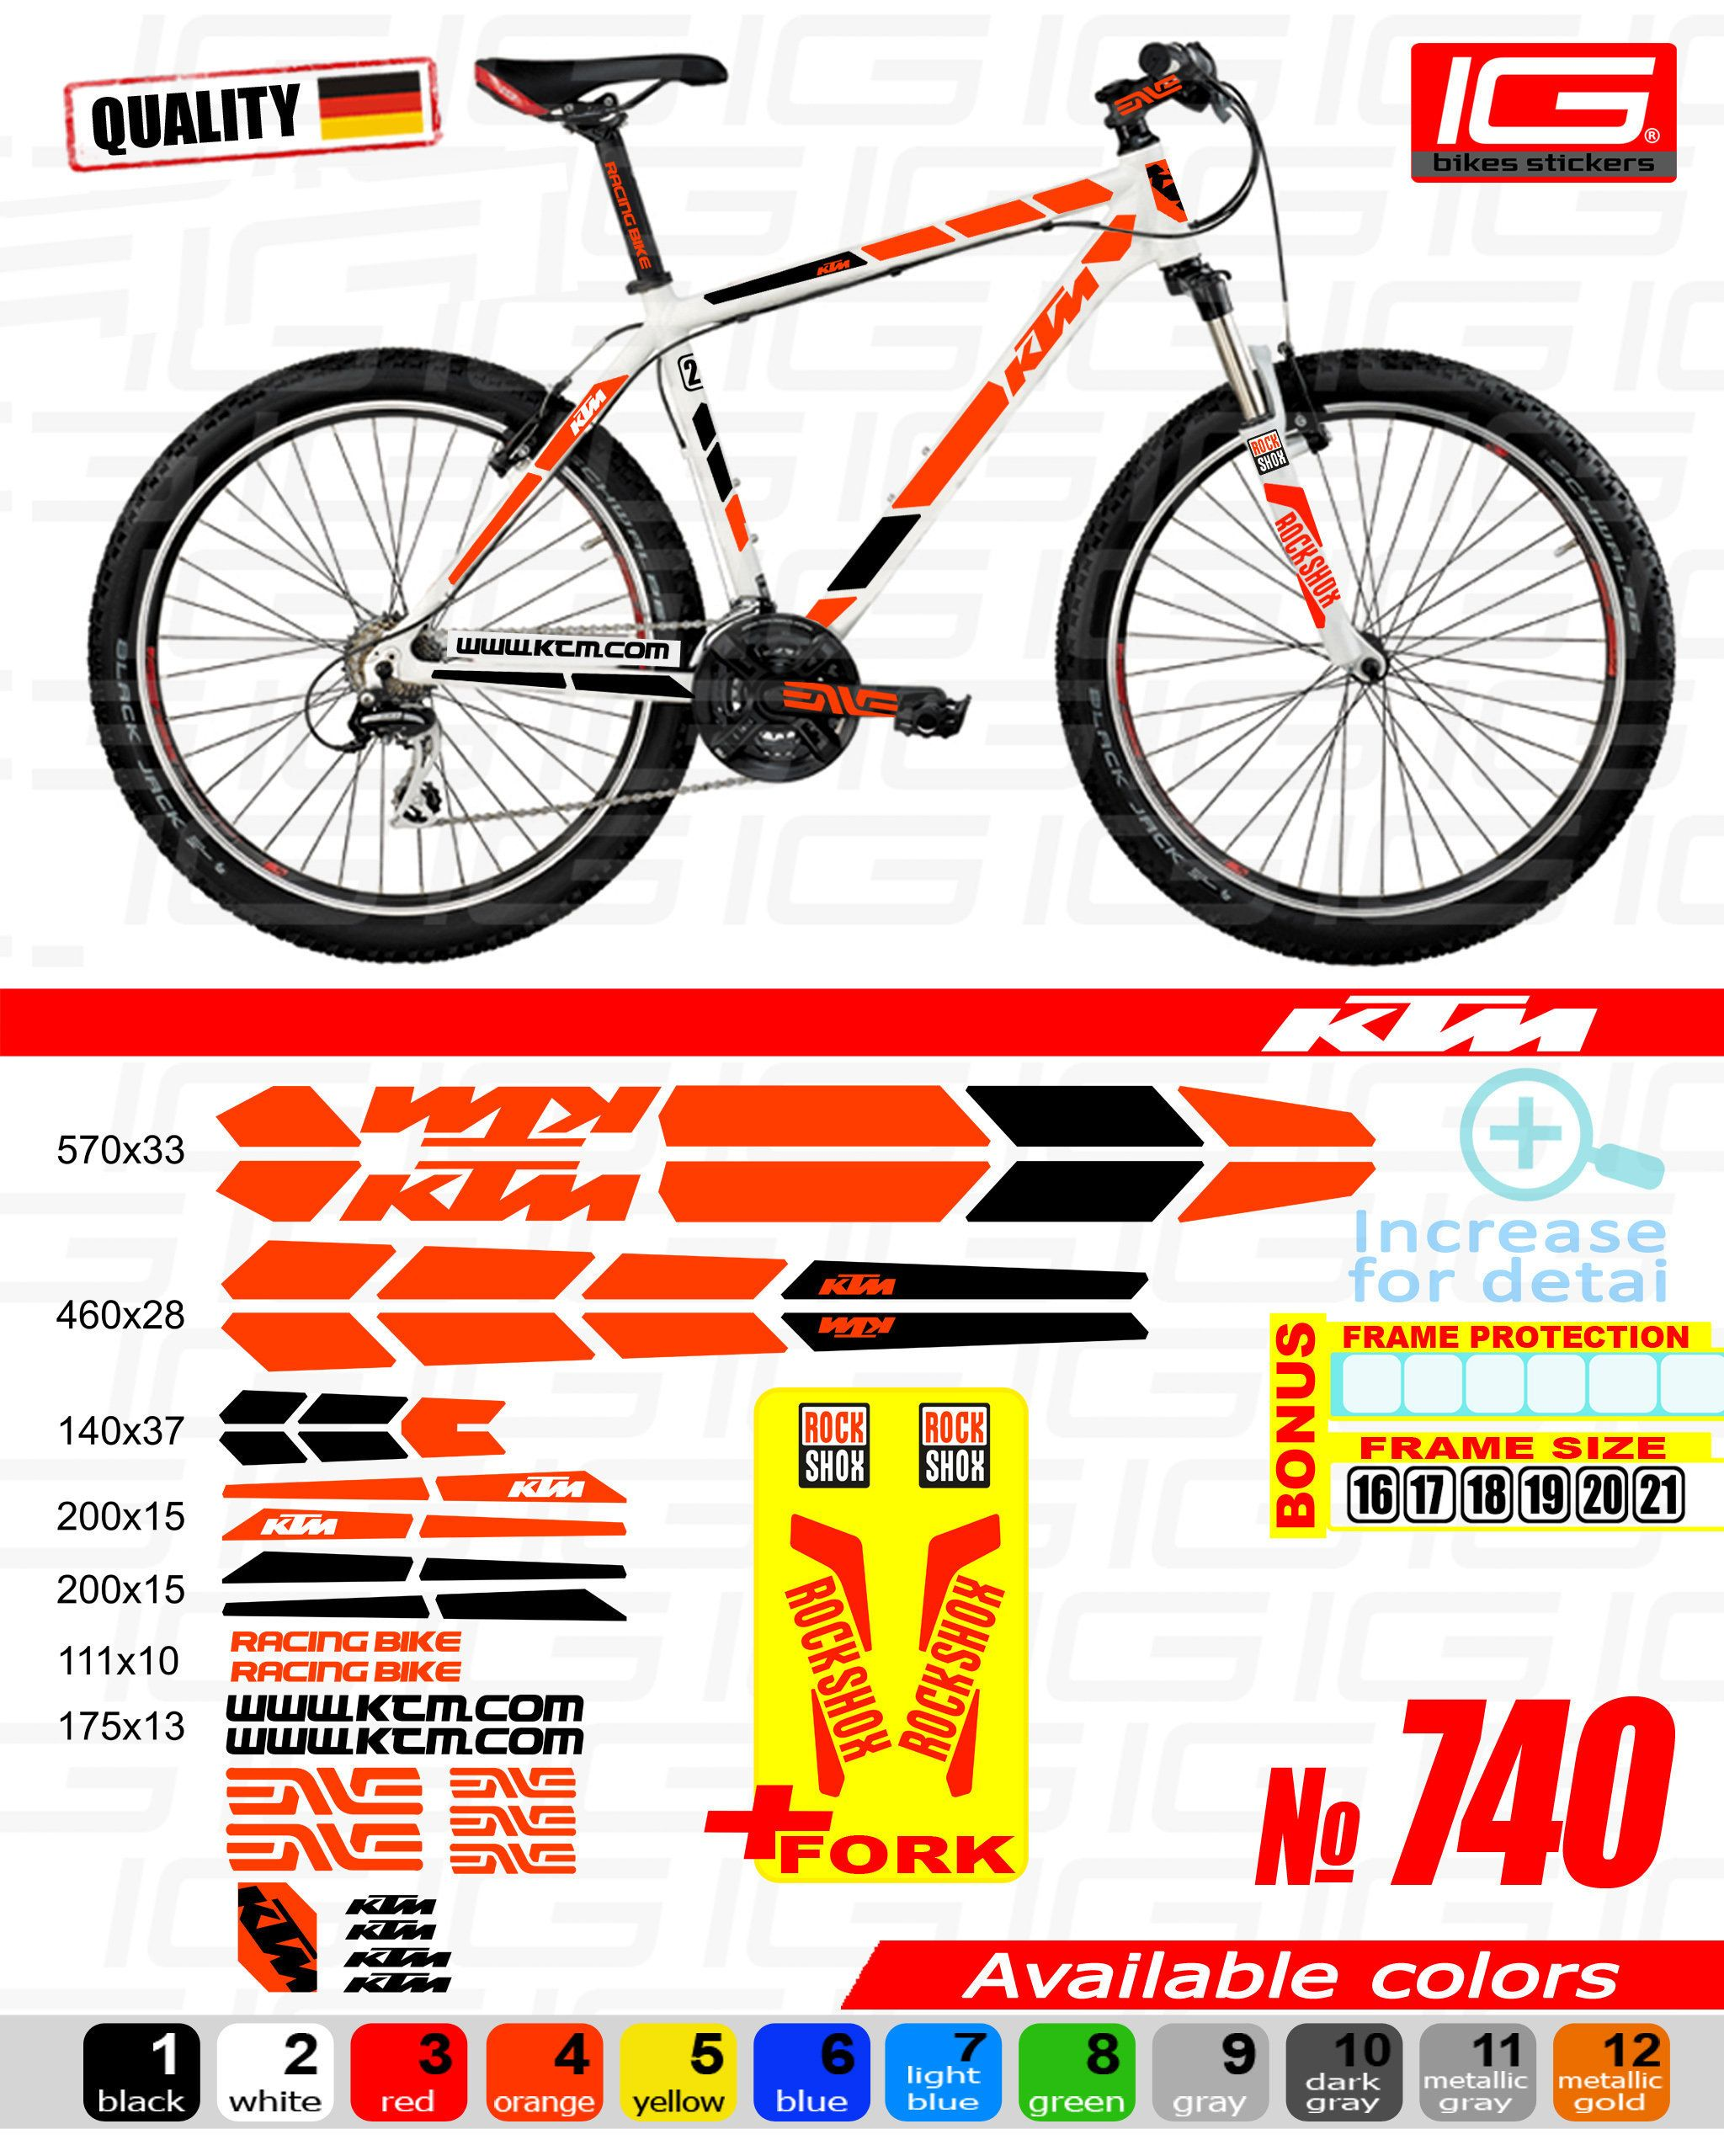 KONA bike stickers bike frame sticker set ALL COLORS AVAILABLE fork